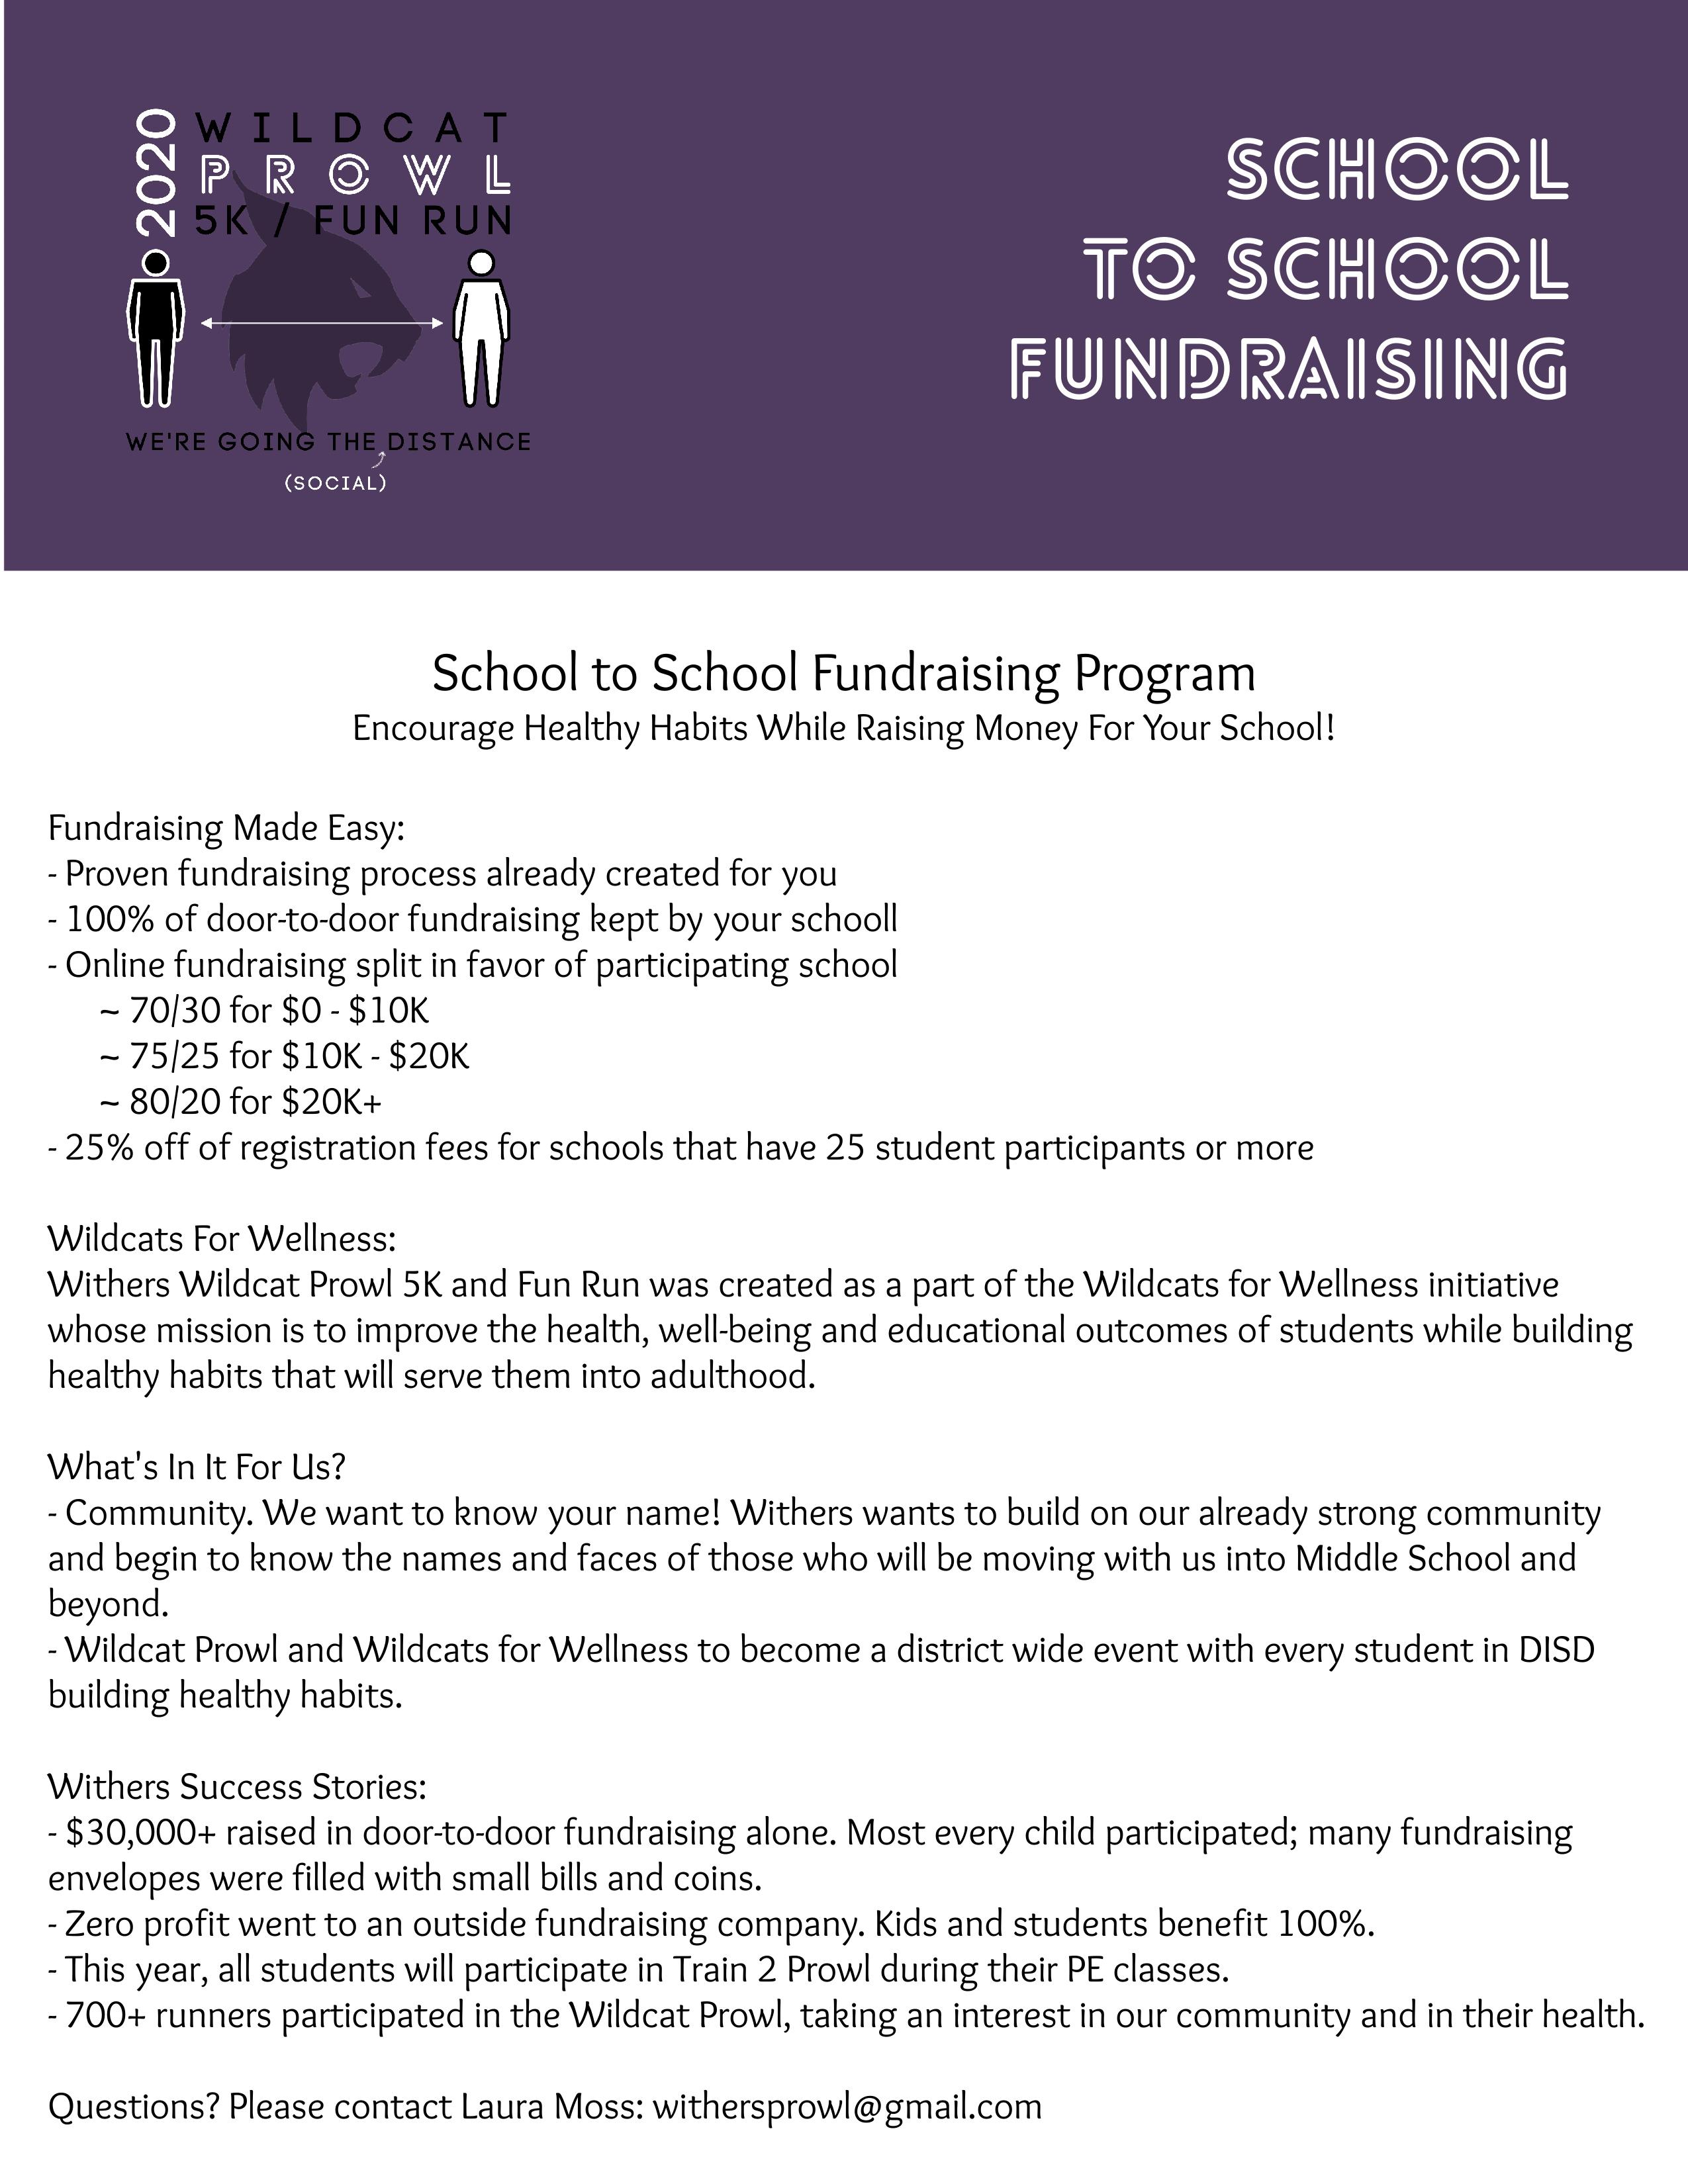 school to school flyer 2020 copy